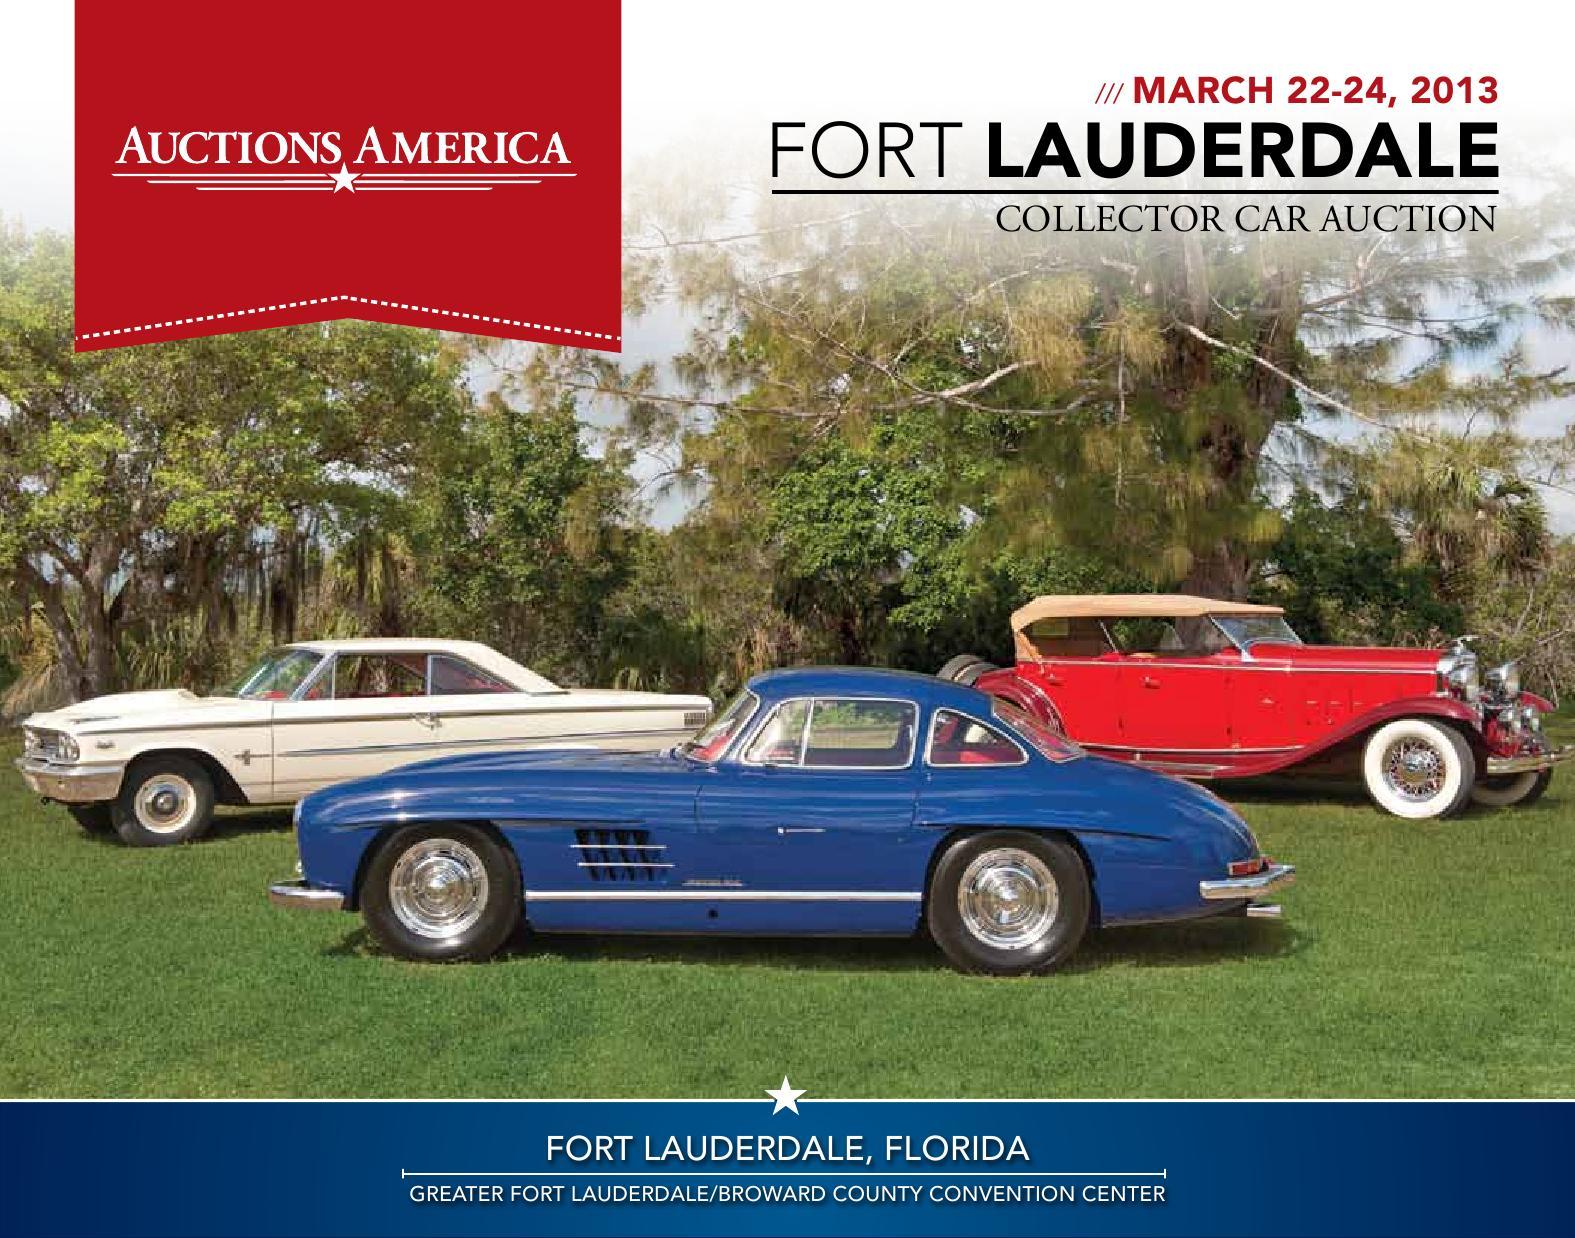 Fort Lauderdale, 2013